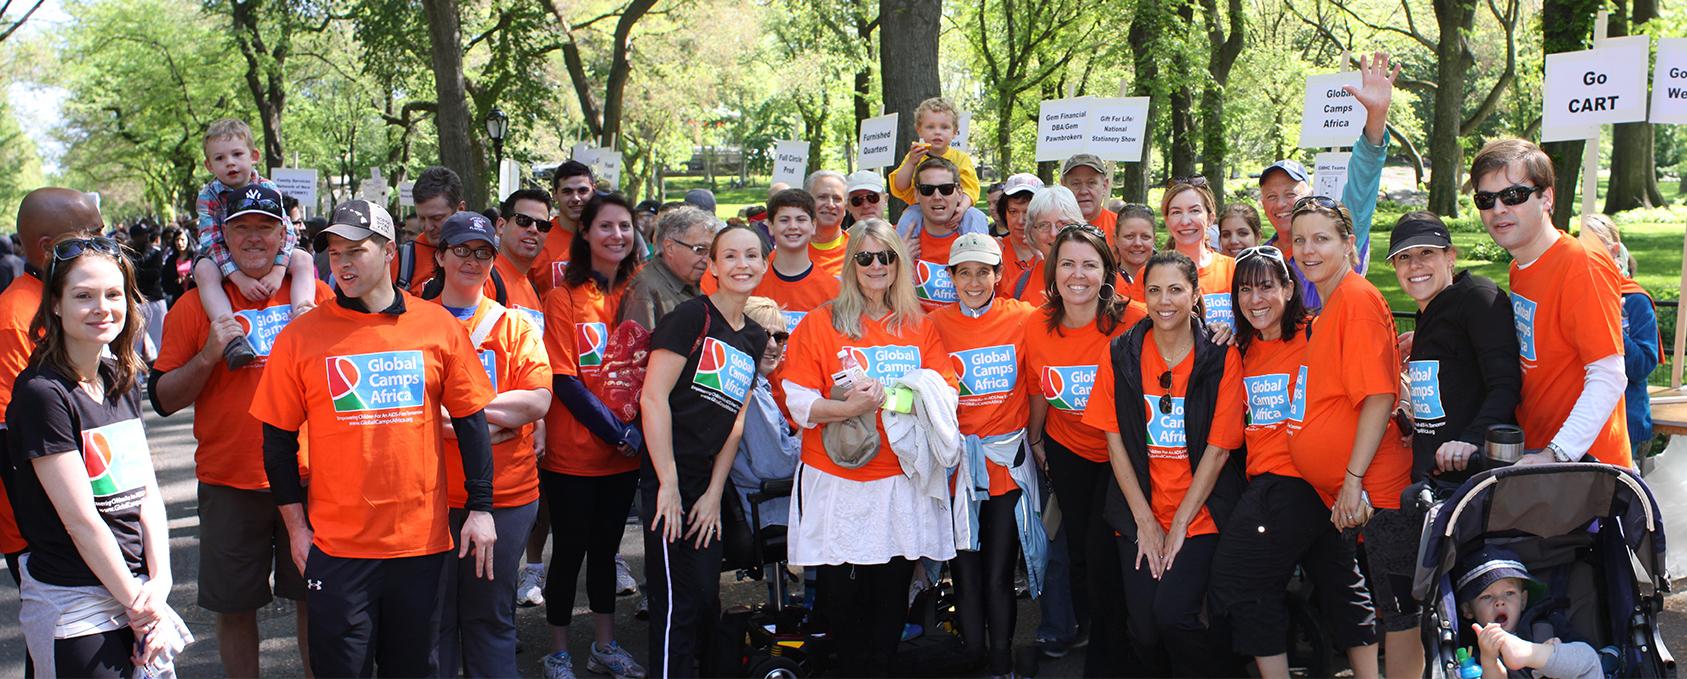 Team GCA AIDS Walk 2014